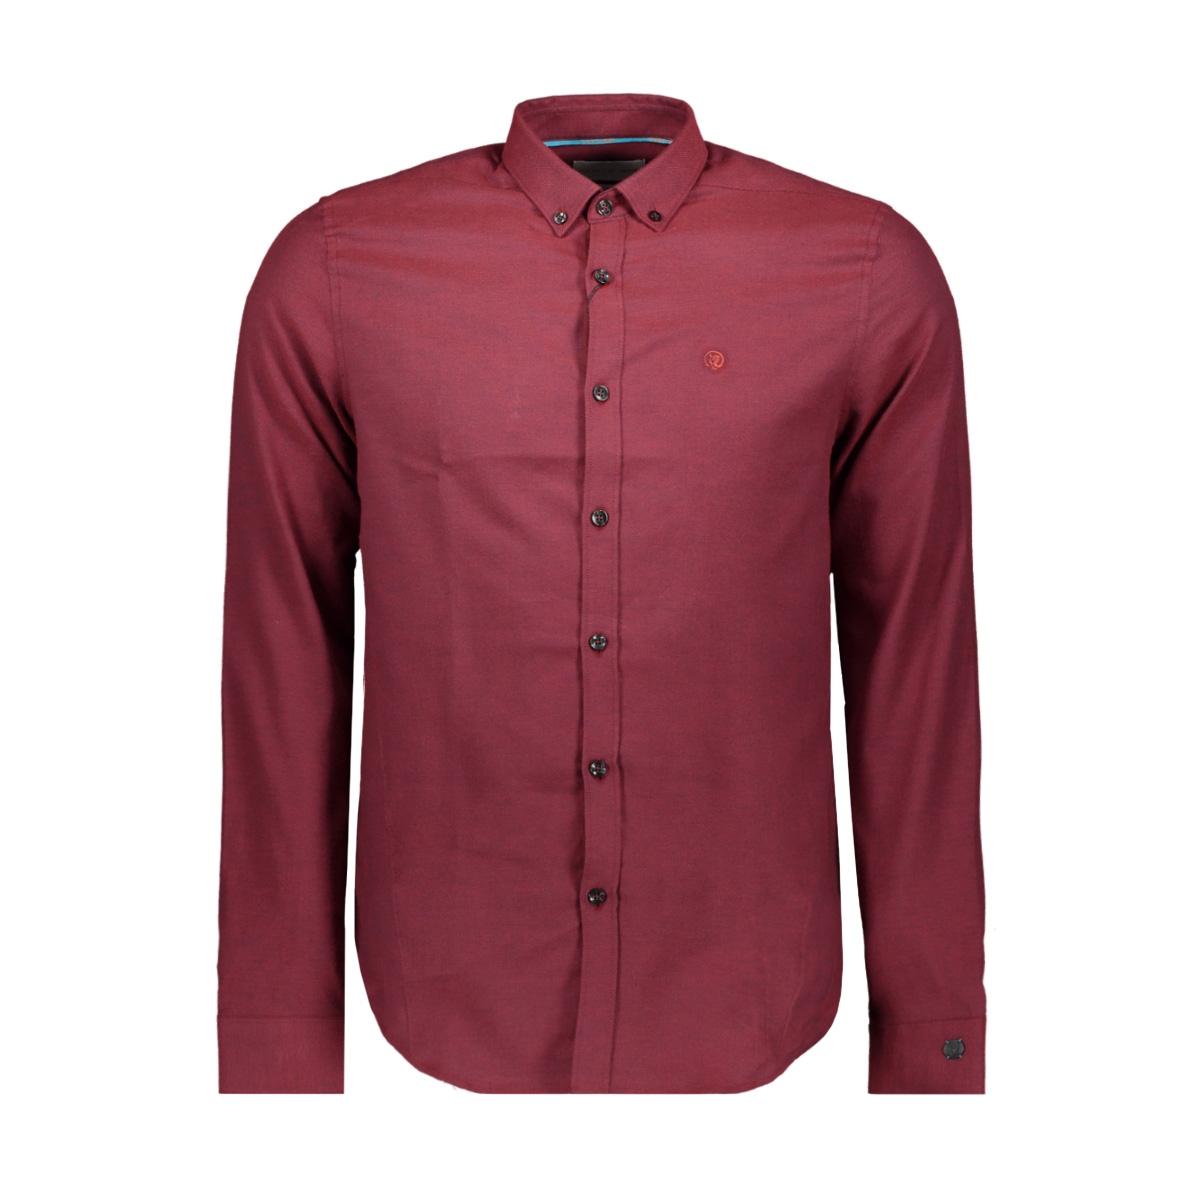 oxford shirt csi198654 cast iron overhemd 3181